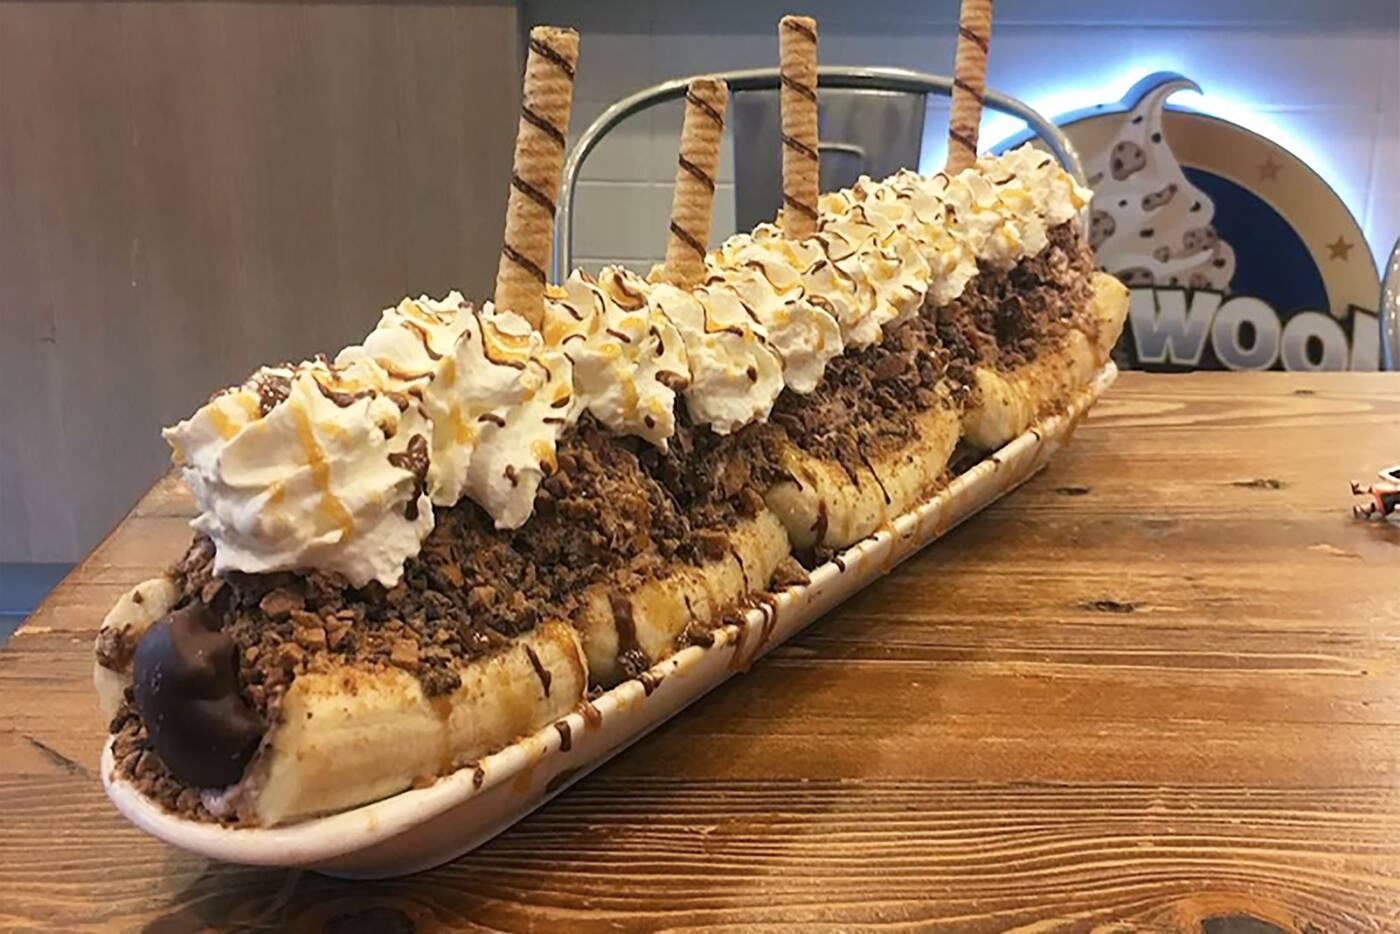 giant toronto foods pizza cone massive donut bakery lamanna hollywood eat banana split slice quality